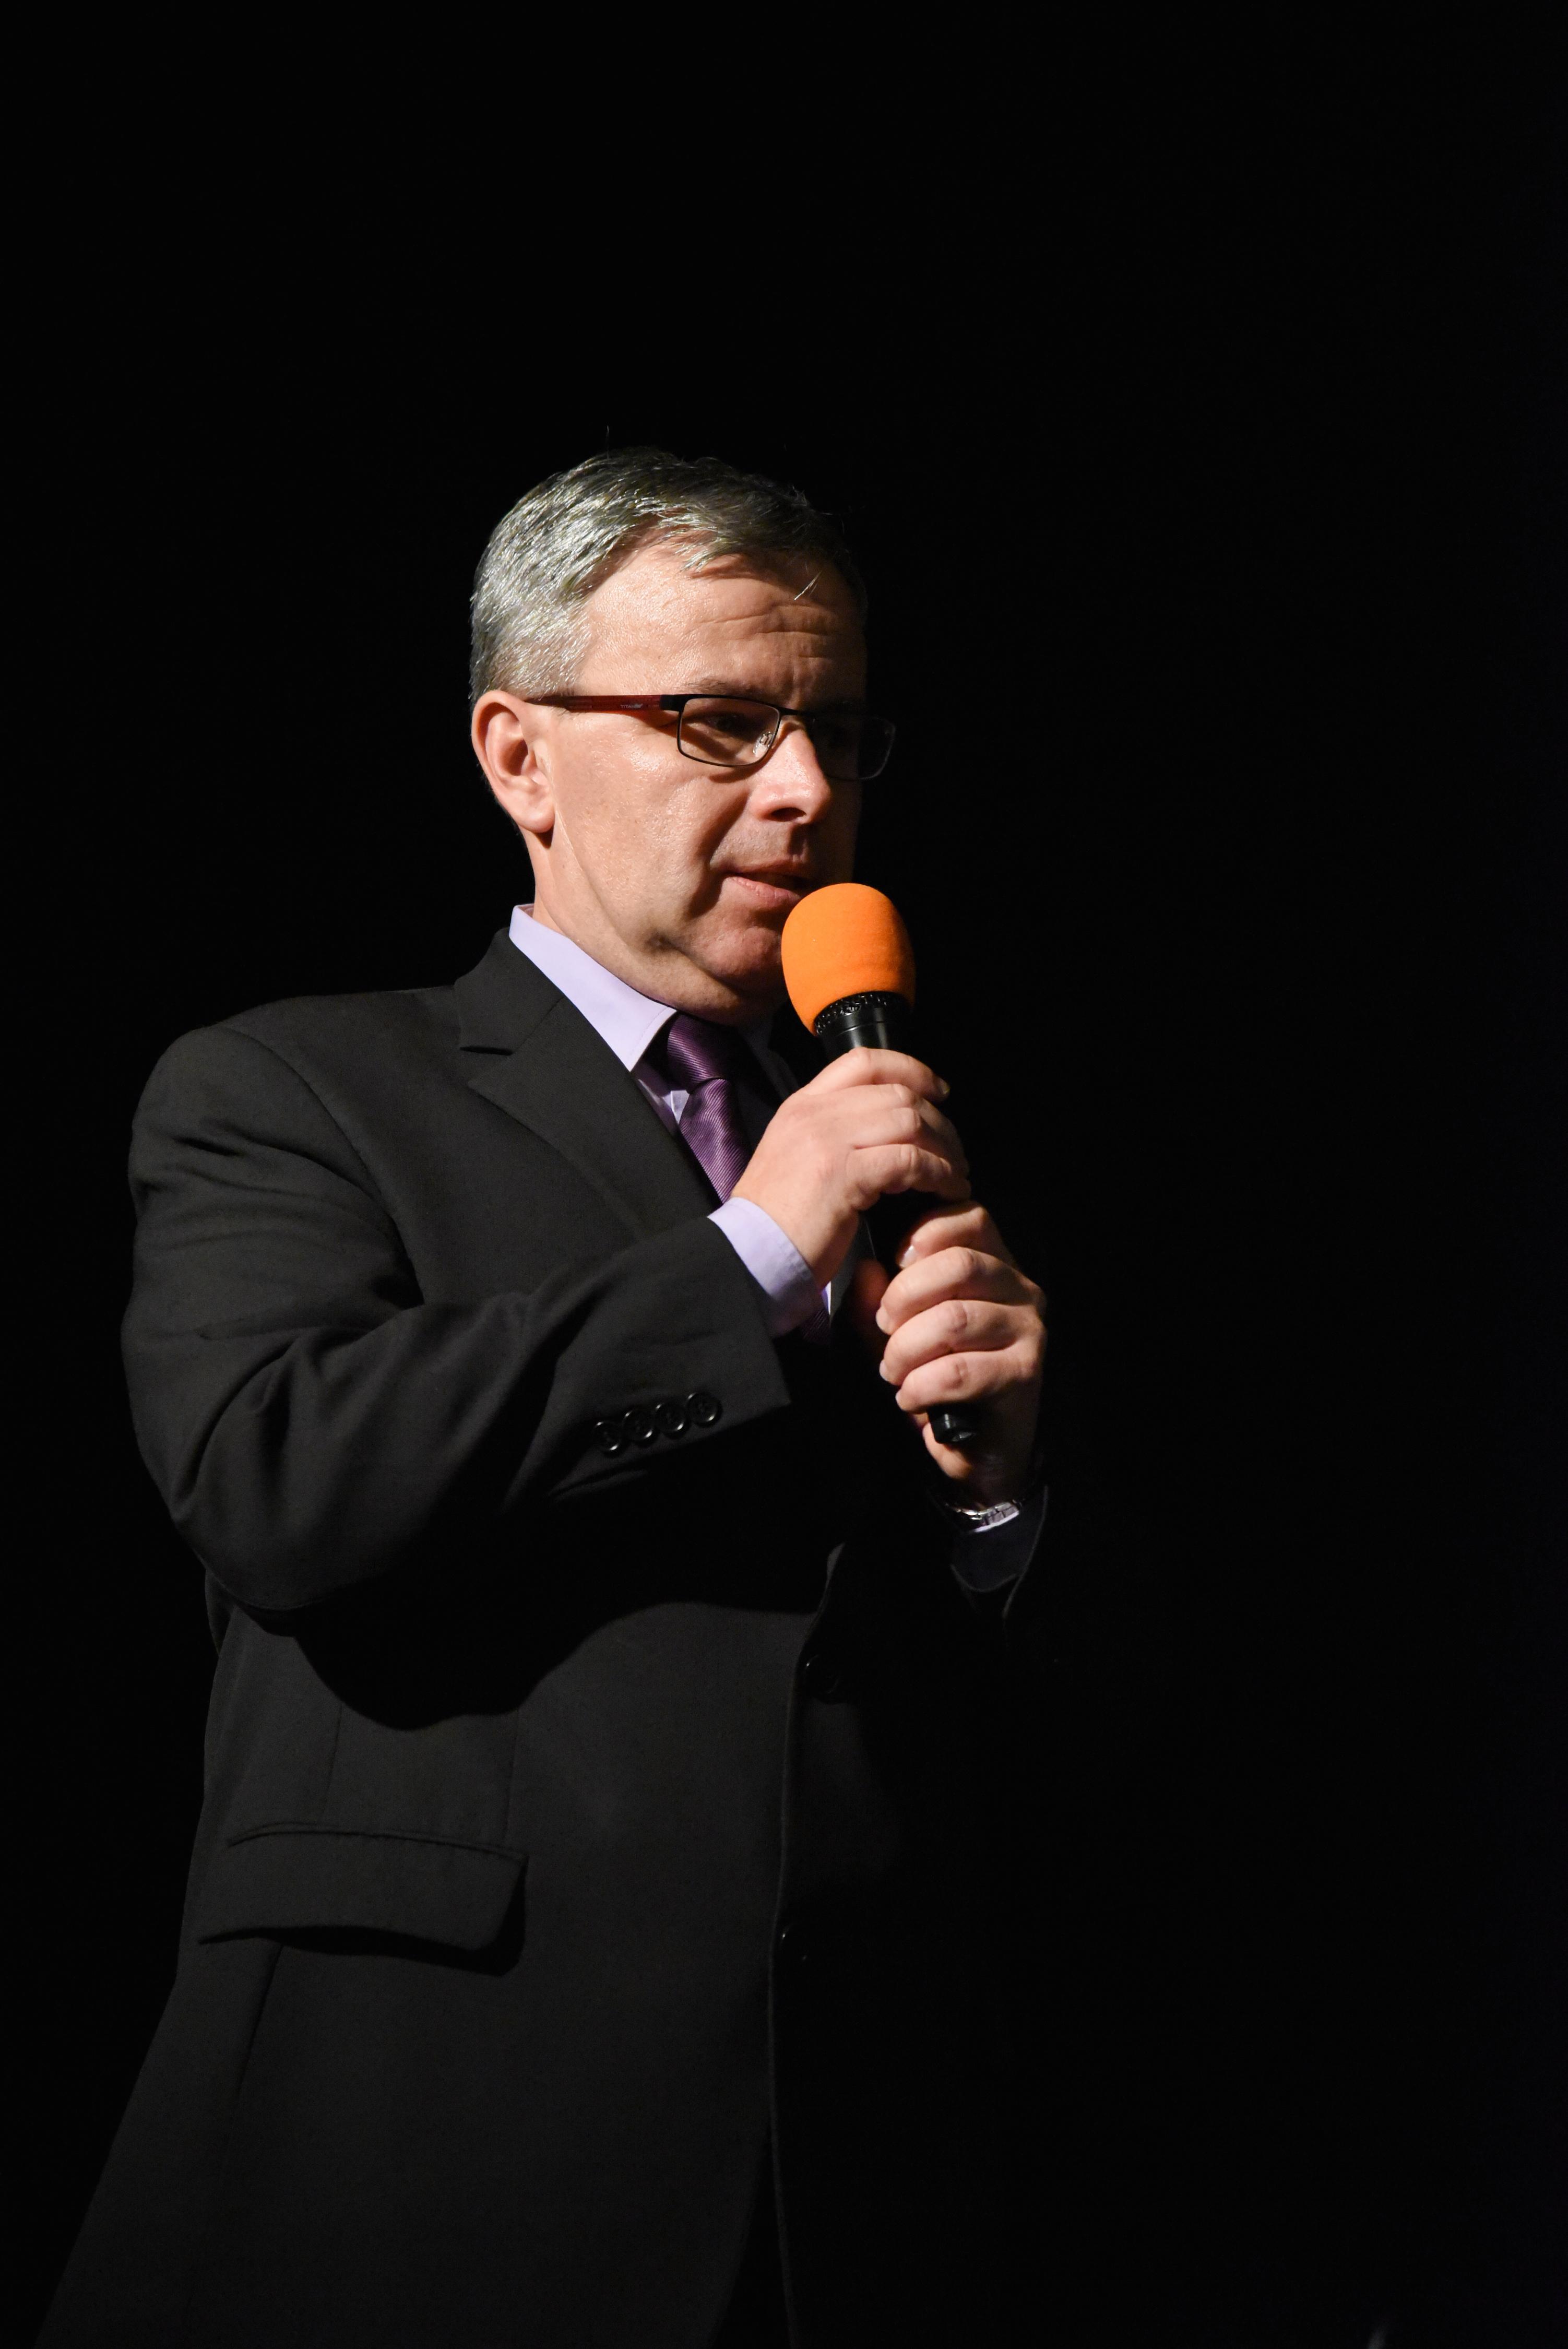 Michal Švarc